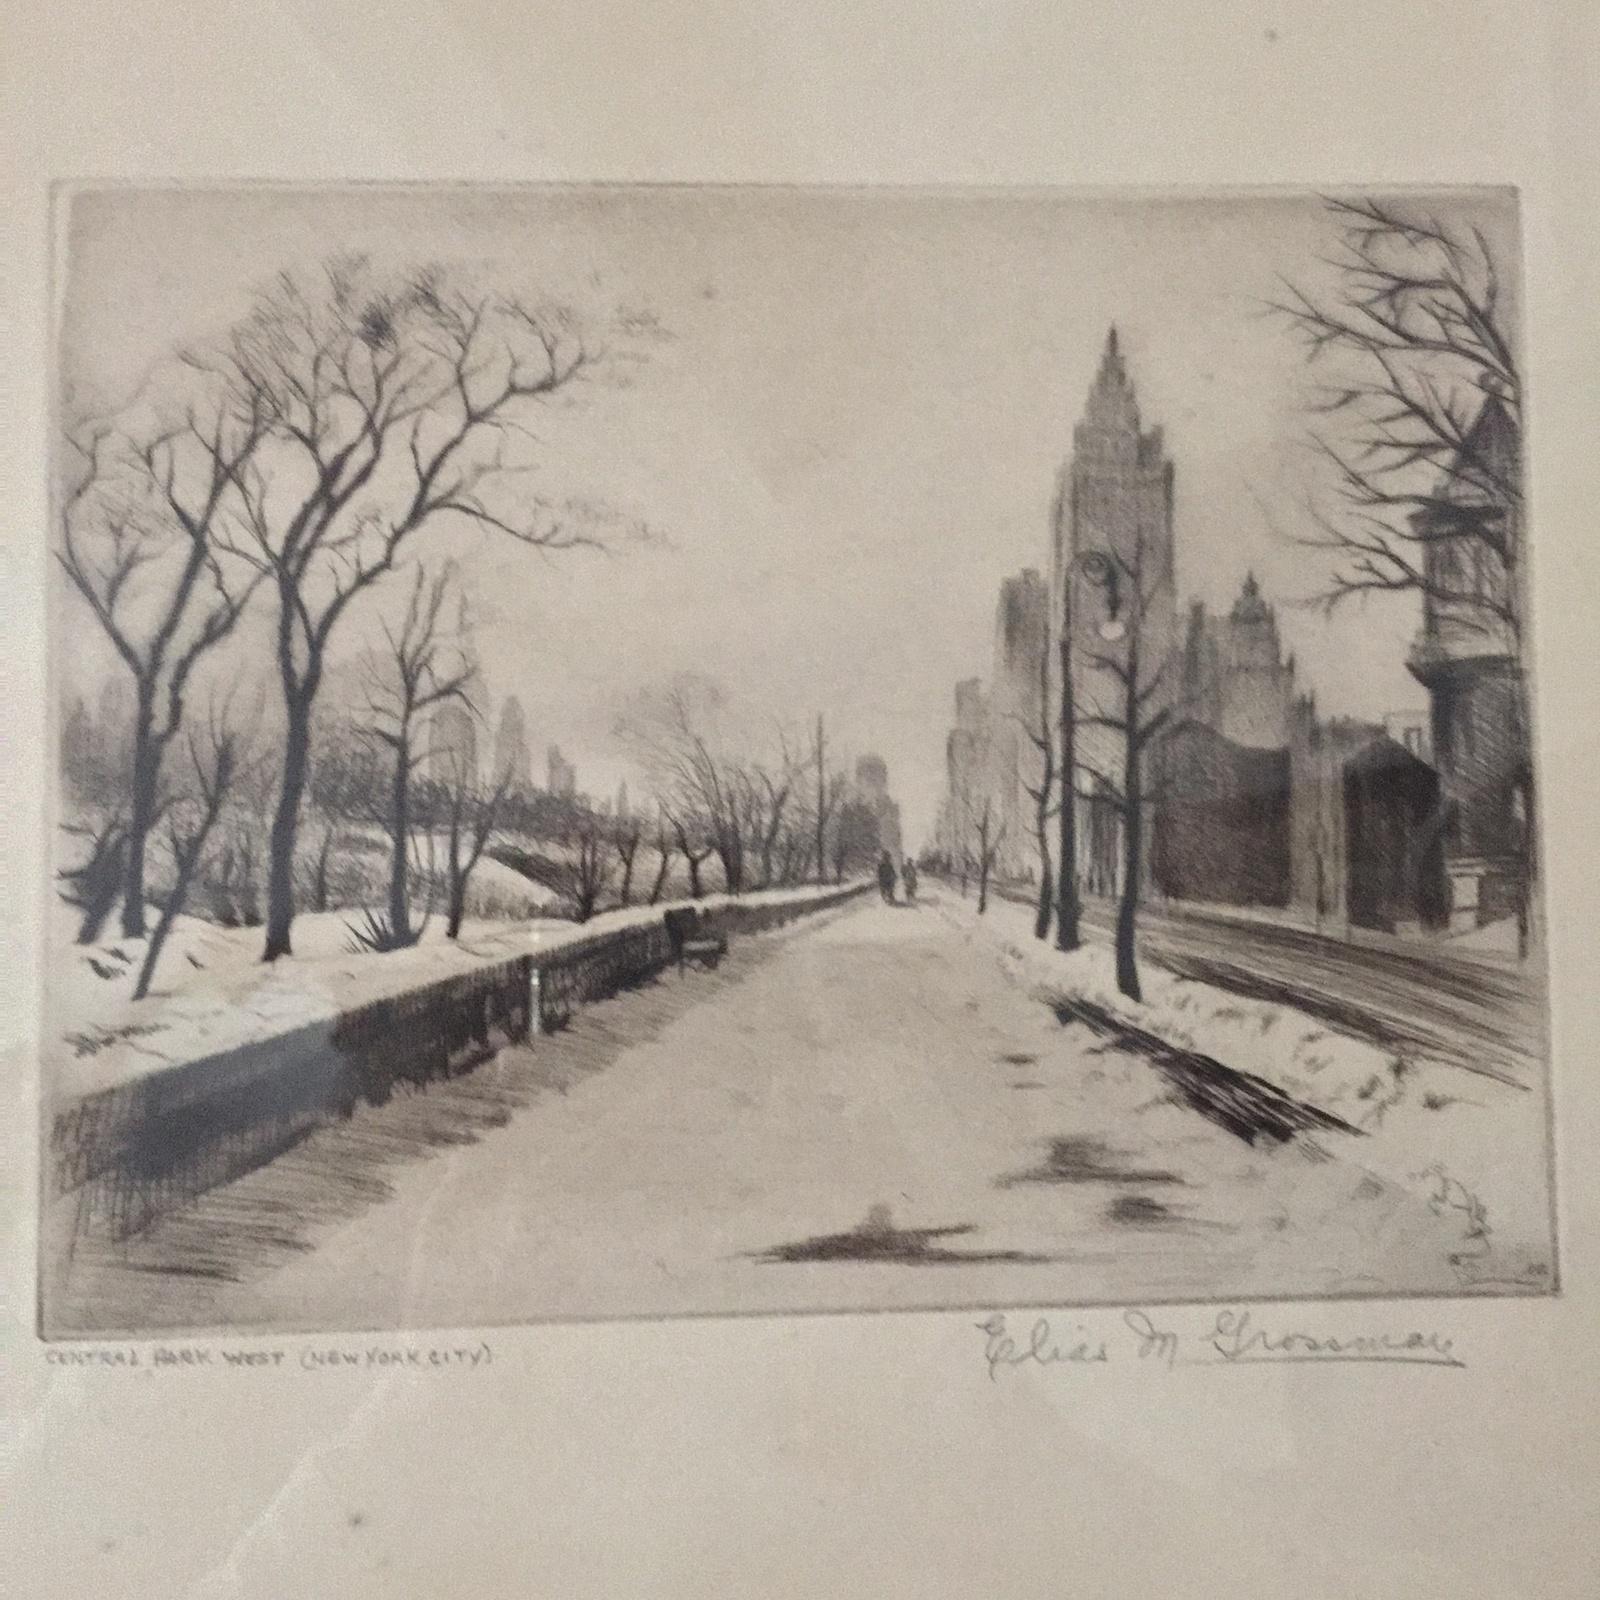 ELIAS M. GROSSMAN ETCHING CENTRAL PARK WEST, NEW YORK